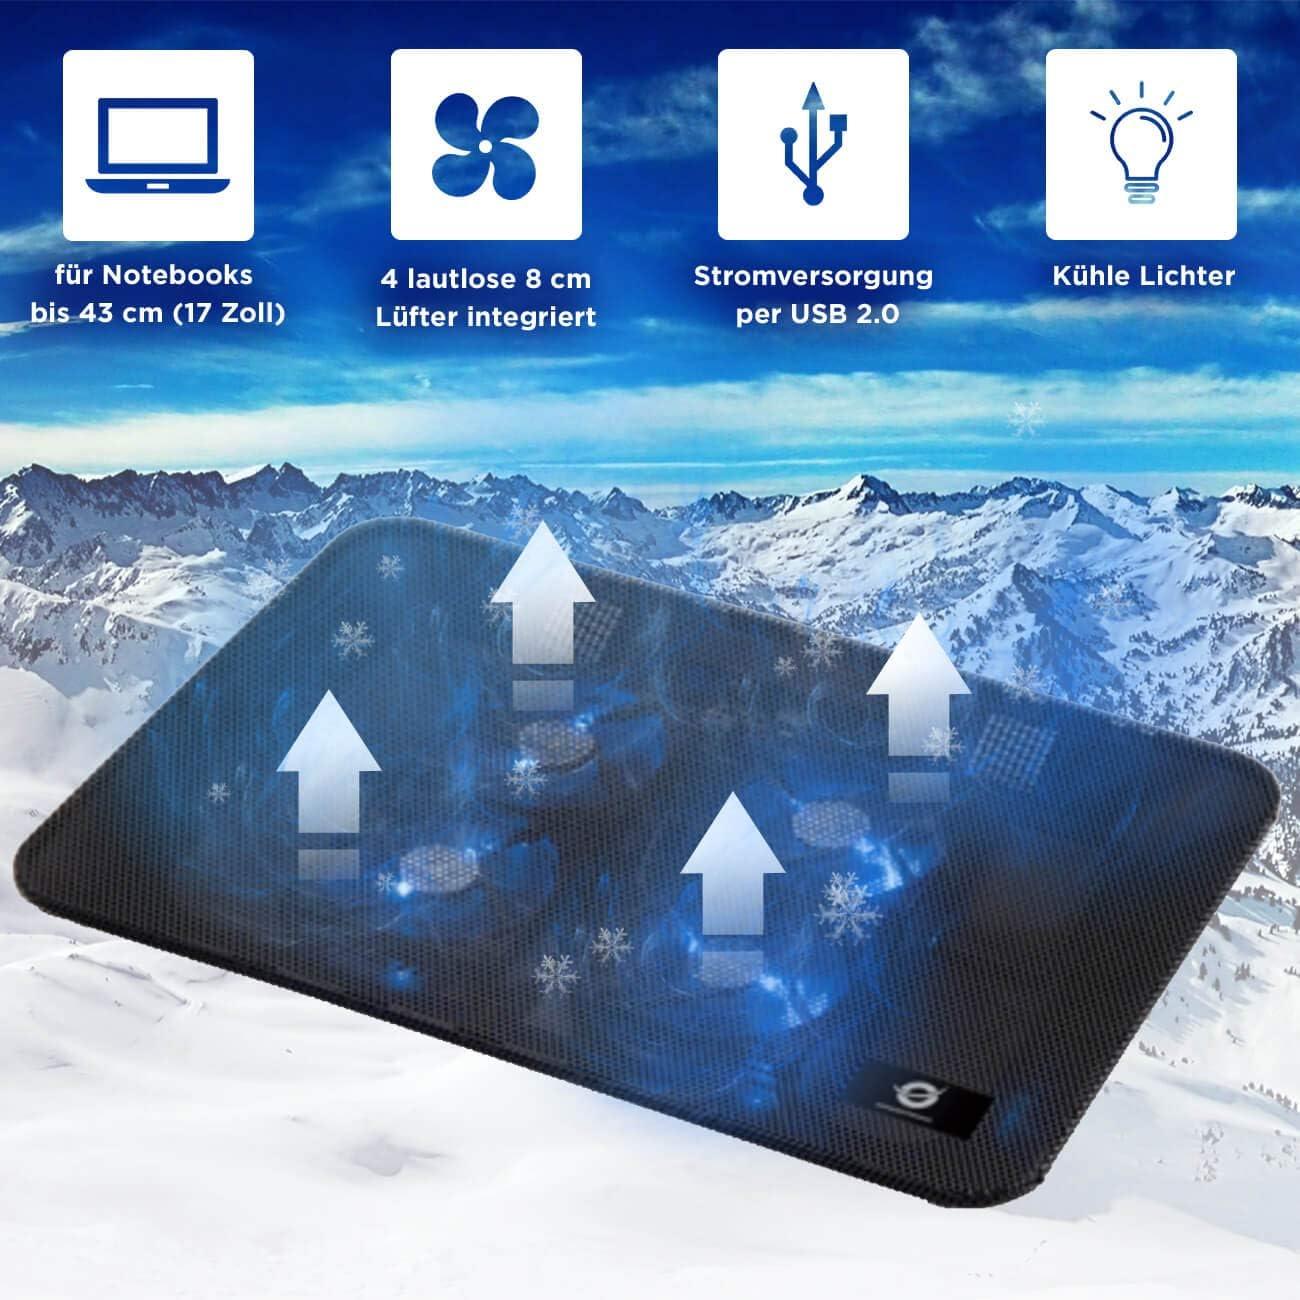 Notebook Cooling Pad f/ür Acer Swift 3 Conceptronic Laptop K/ühler Halterung Cooler St/änder 2 L/üftern Schwarz